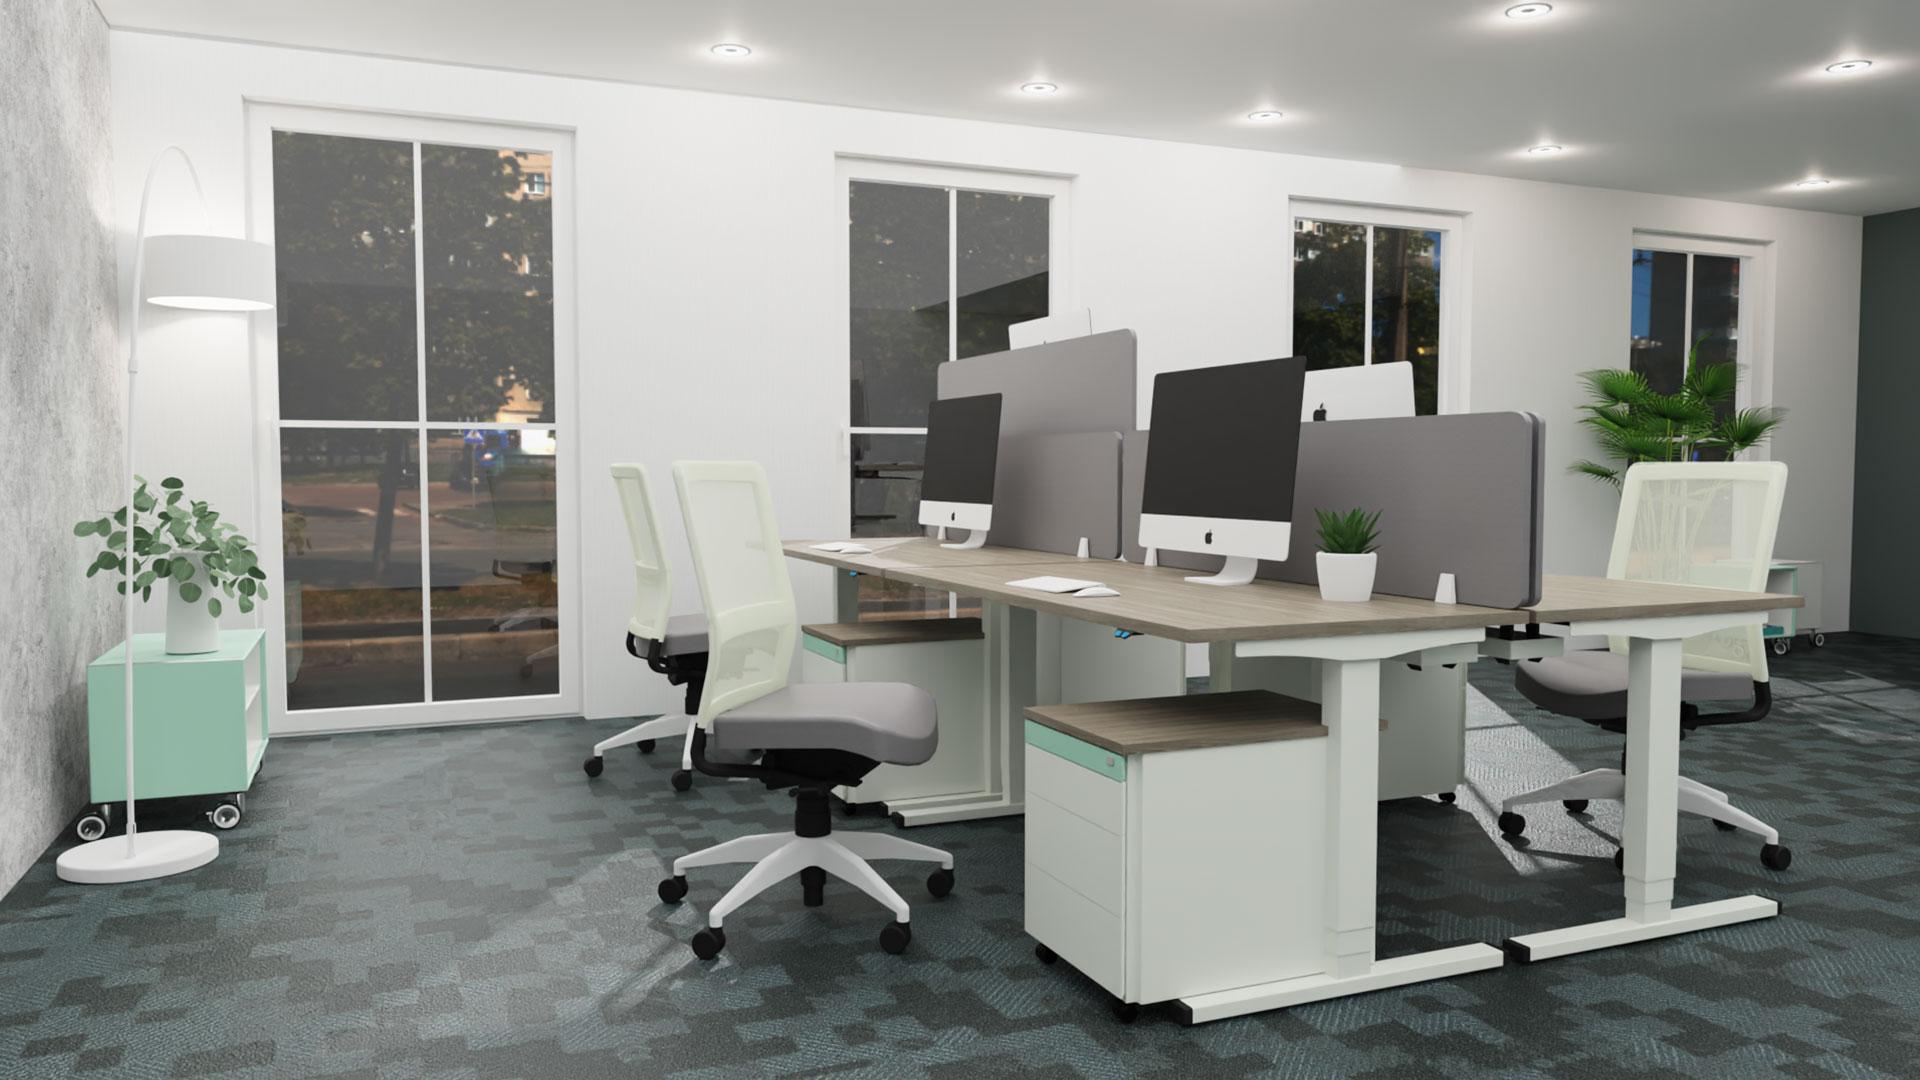 Softboard-Akustik-Aufsatzelement-grau-Gruppenarbeitsplatz-mauser